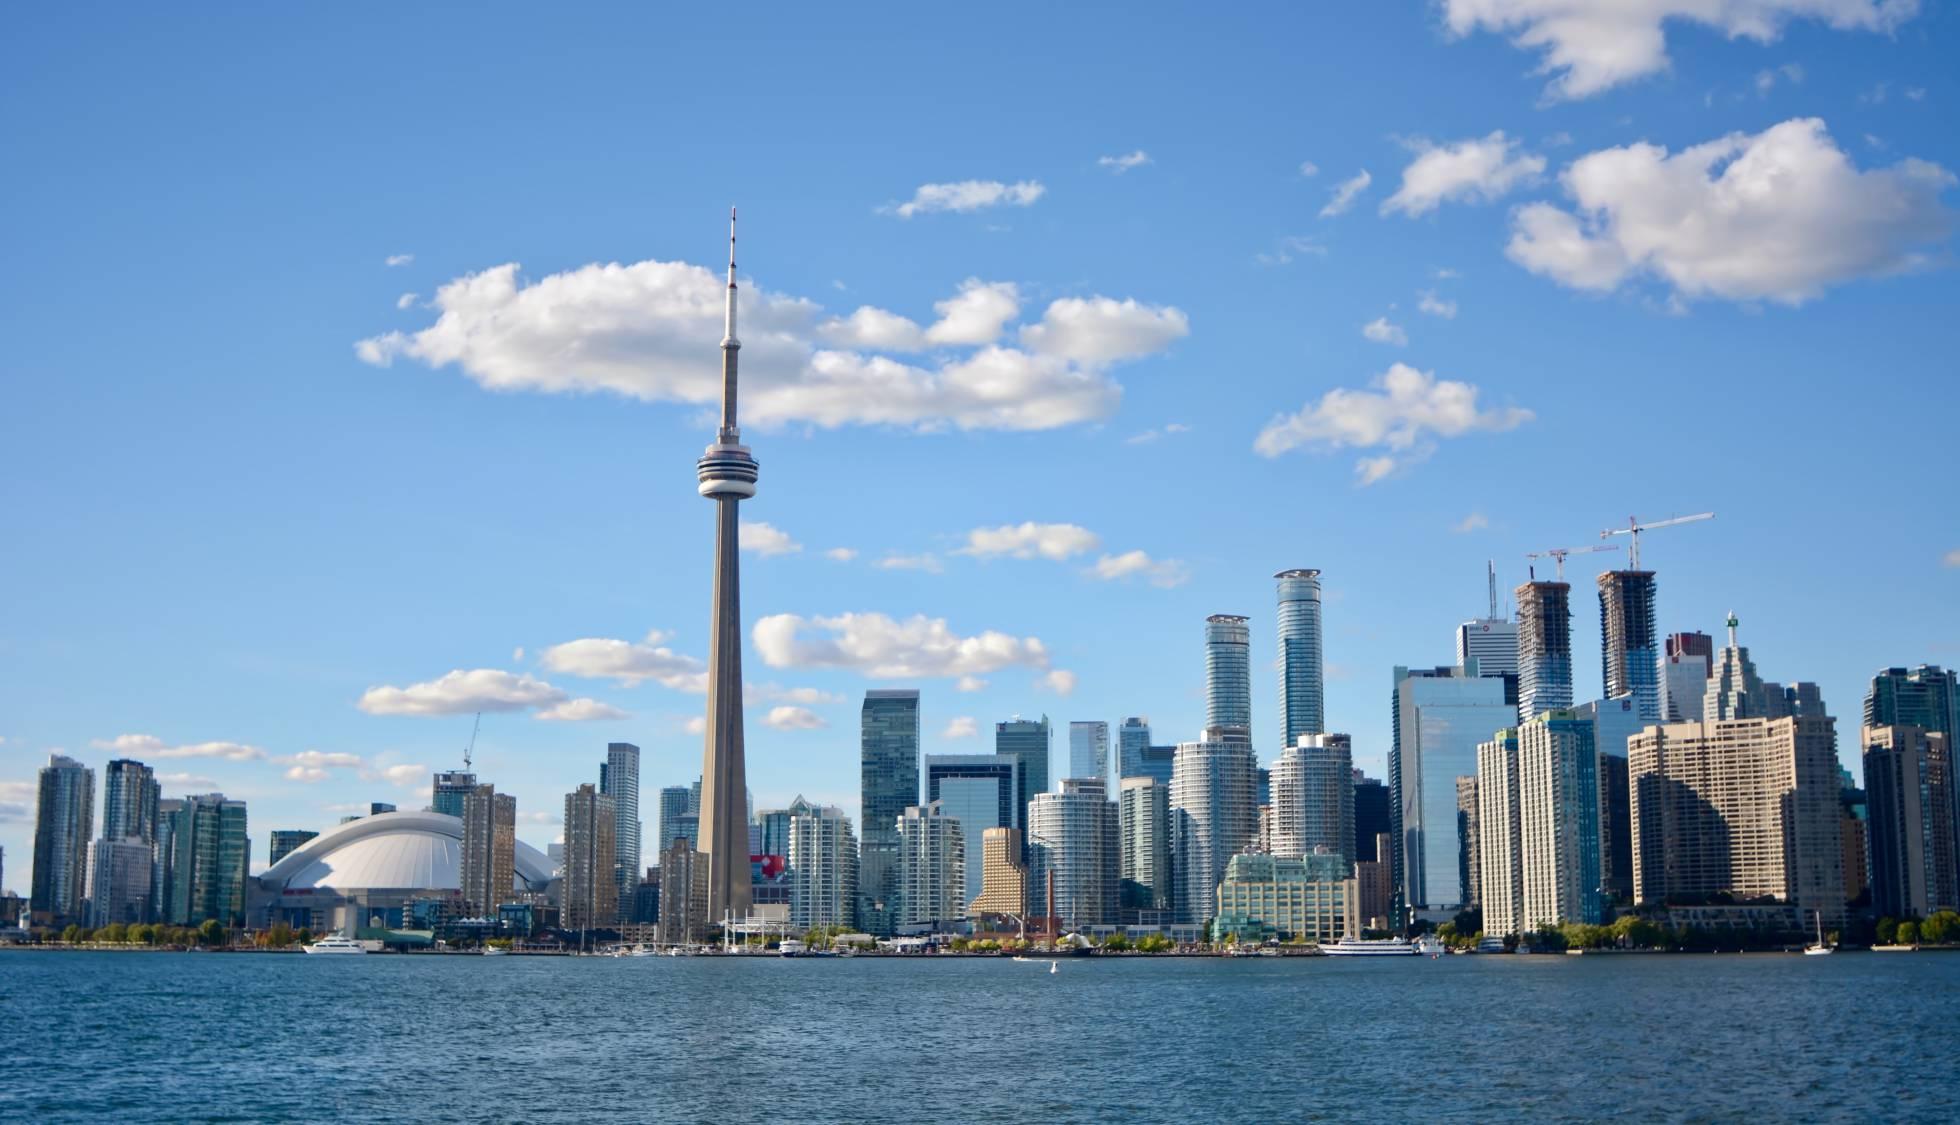 Noticias | Doing Business in Toronto (Ontario) and Peru